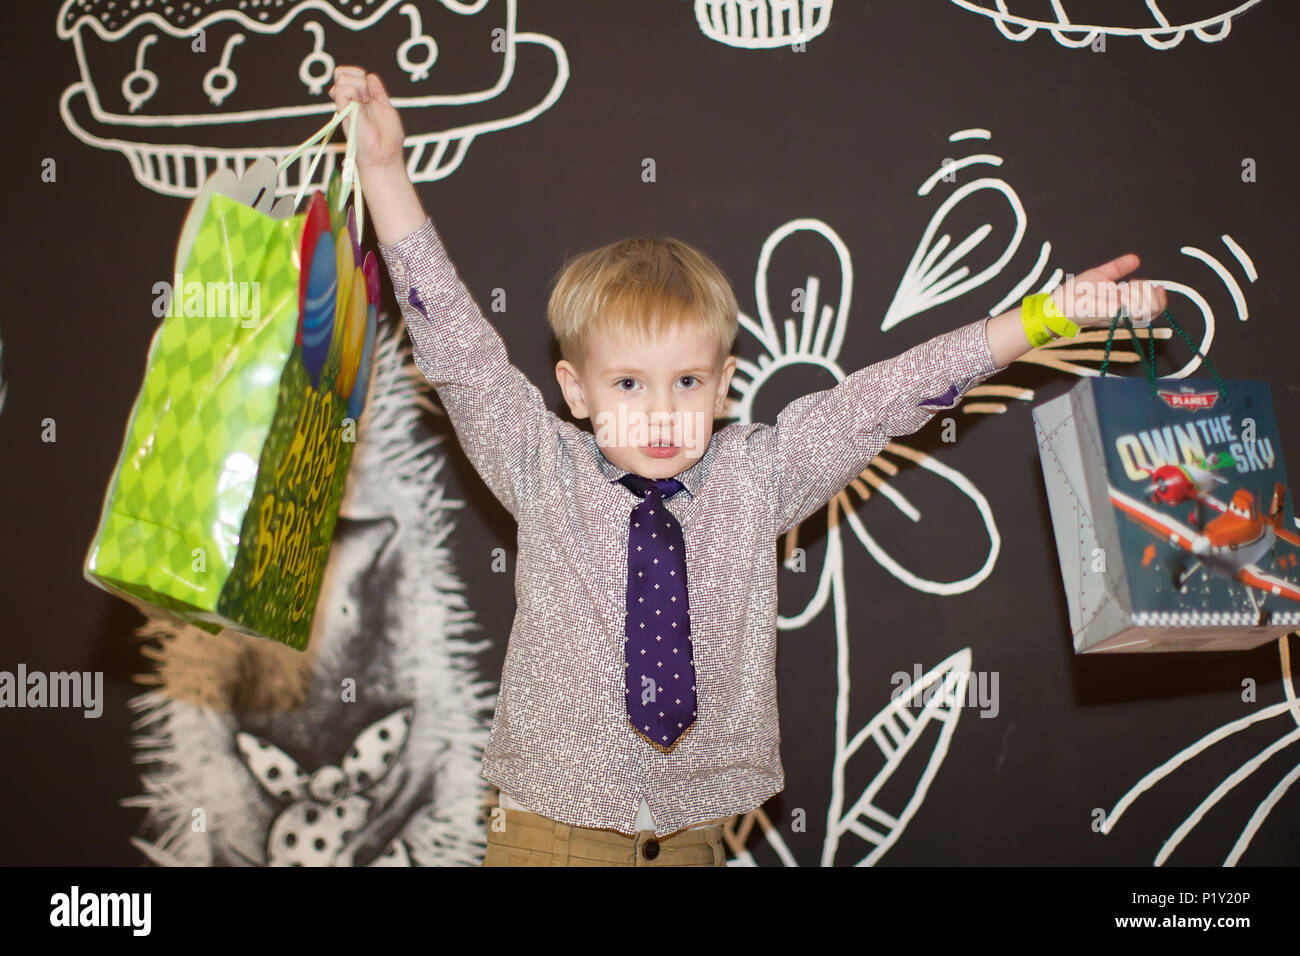 Belarus, Gomel, February 6, 2018. Children's entertainment center in the hypermarket. Children's holiday.Joyful little boy with gifts - Stock Image